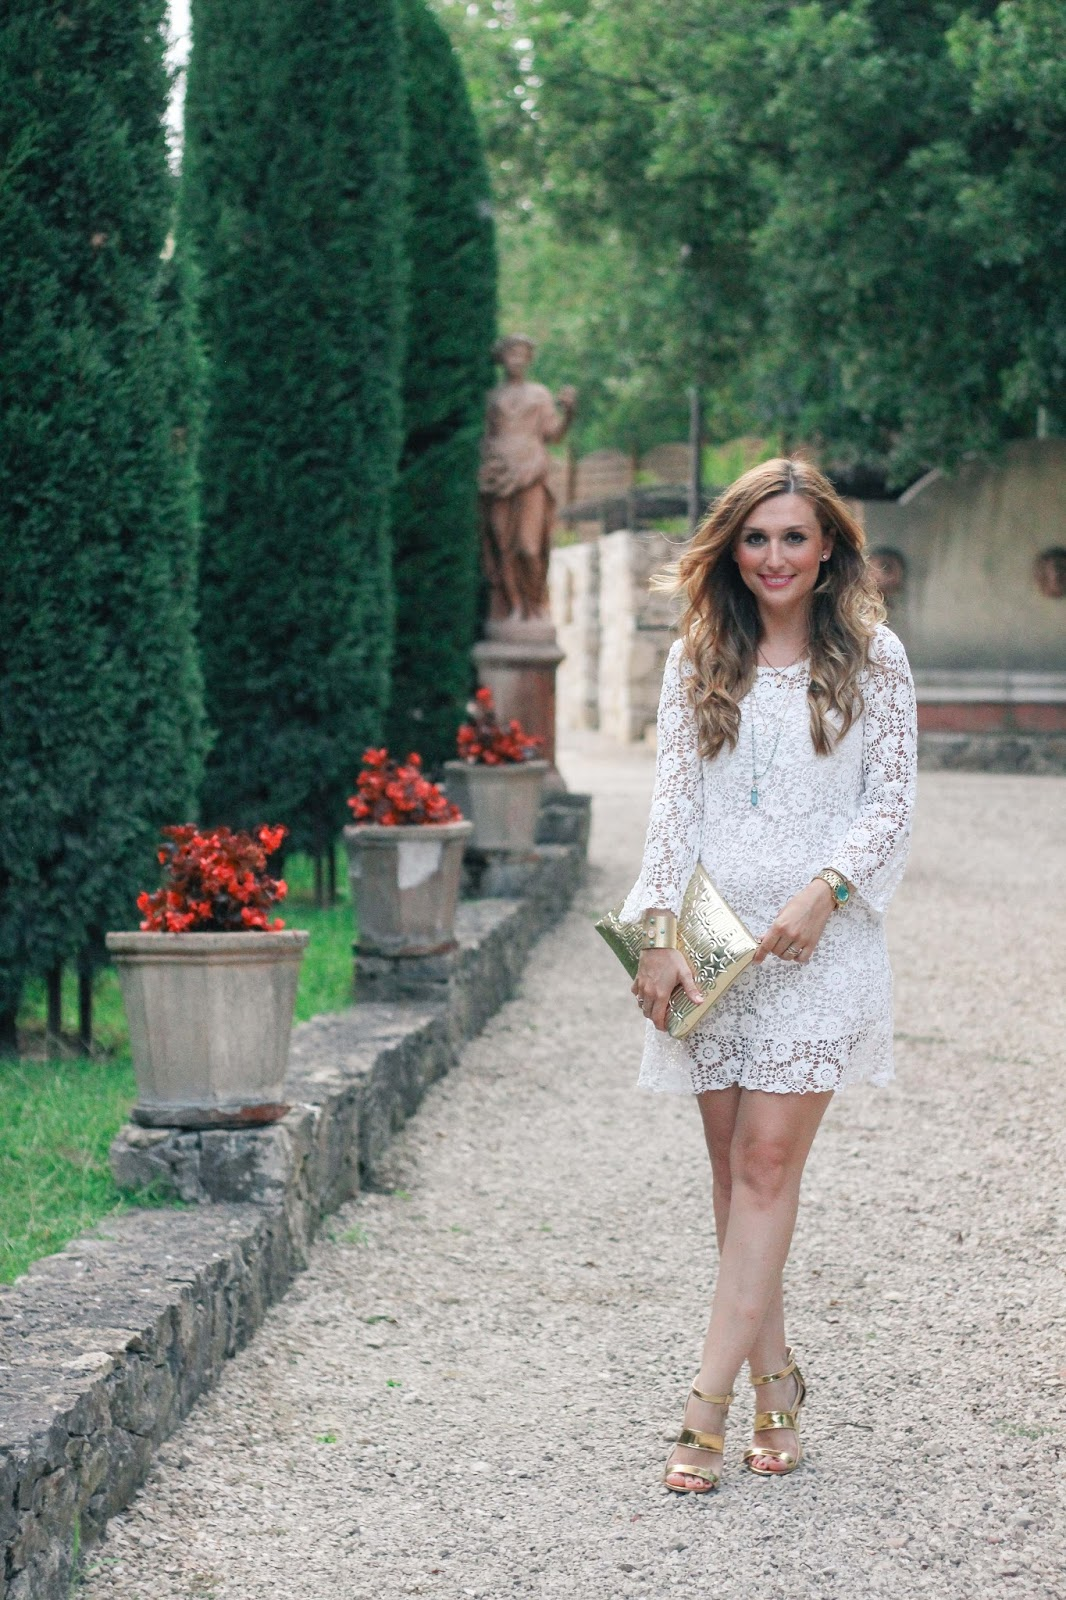 Goldene-schuhe-kombinieren-fashionblogger